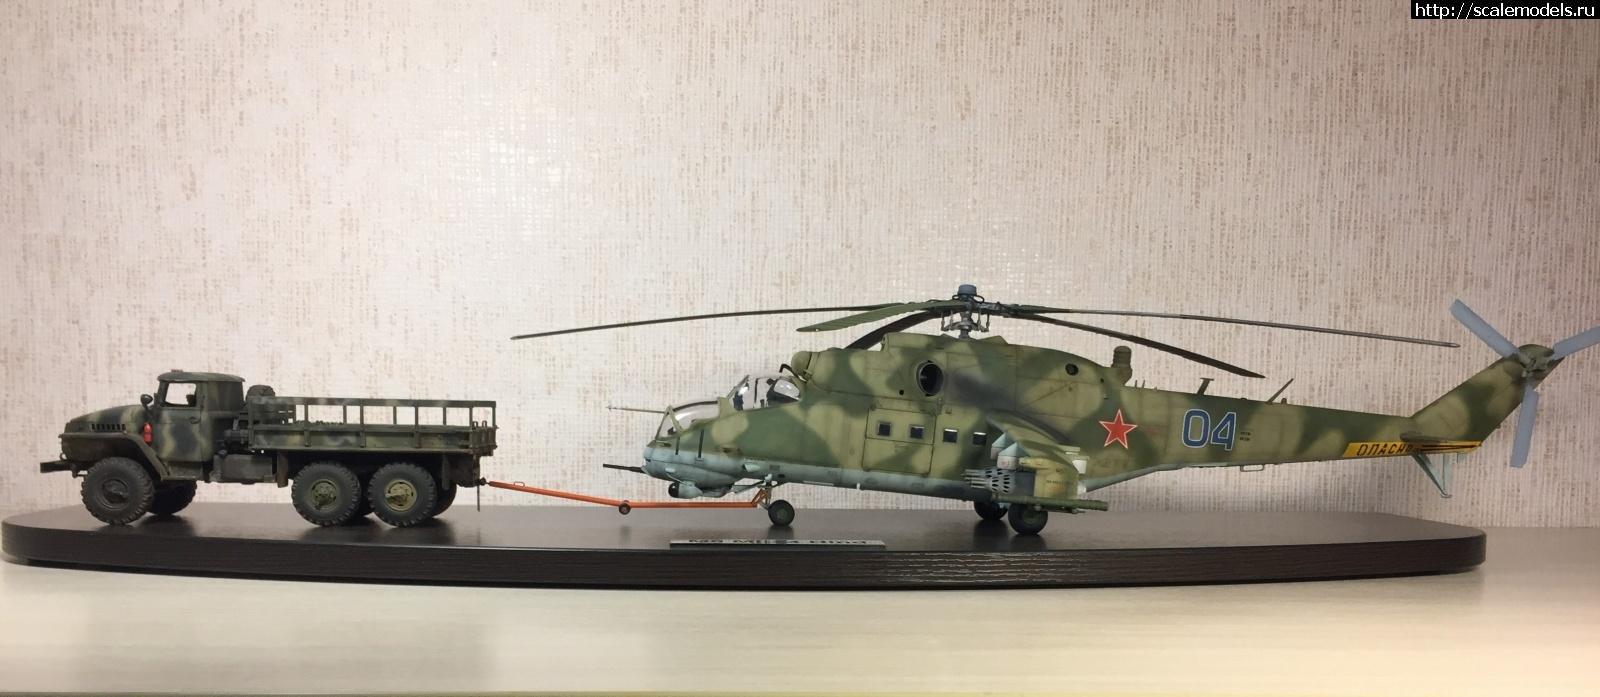 #1612553/ KittyHawk 1/35 MH-60L Blackhawk(#14077) - обсуждение Закрыть окно